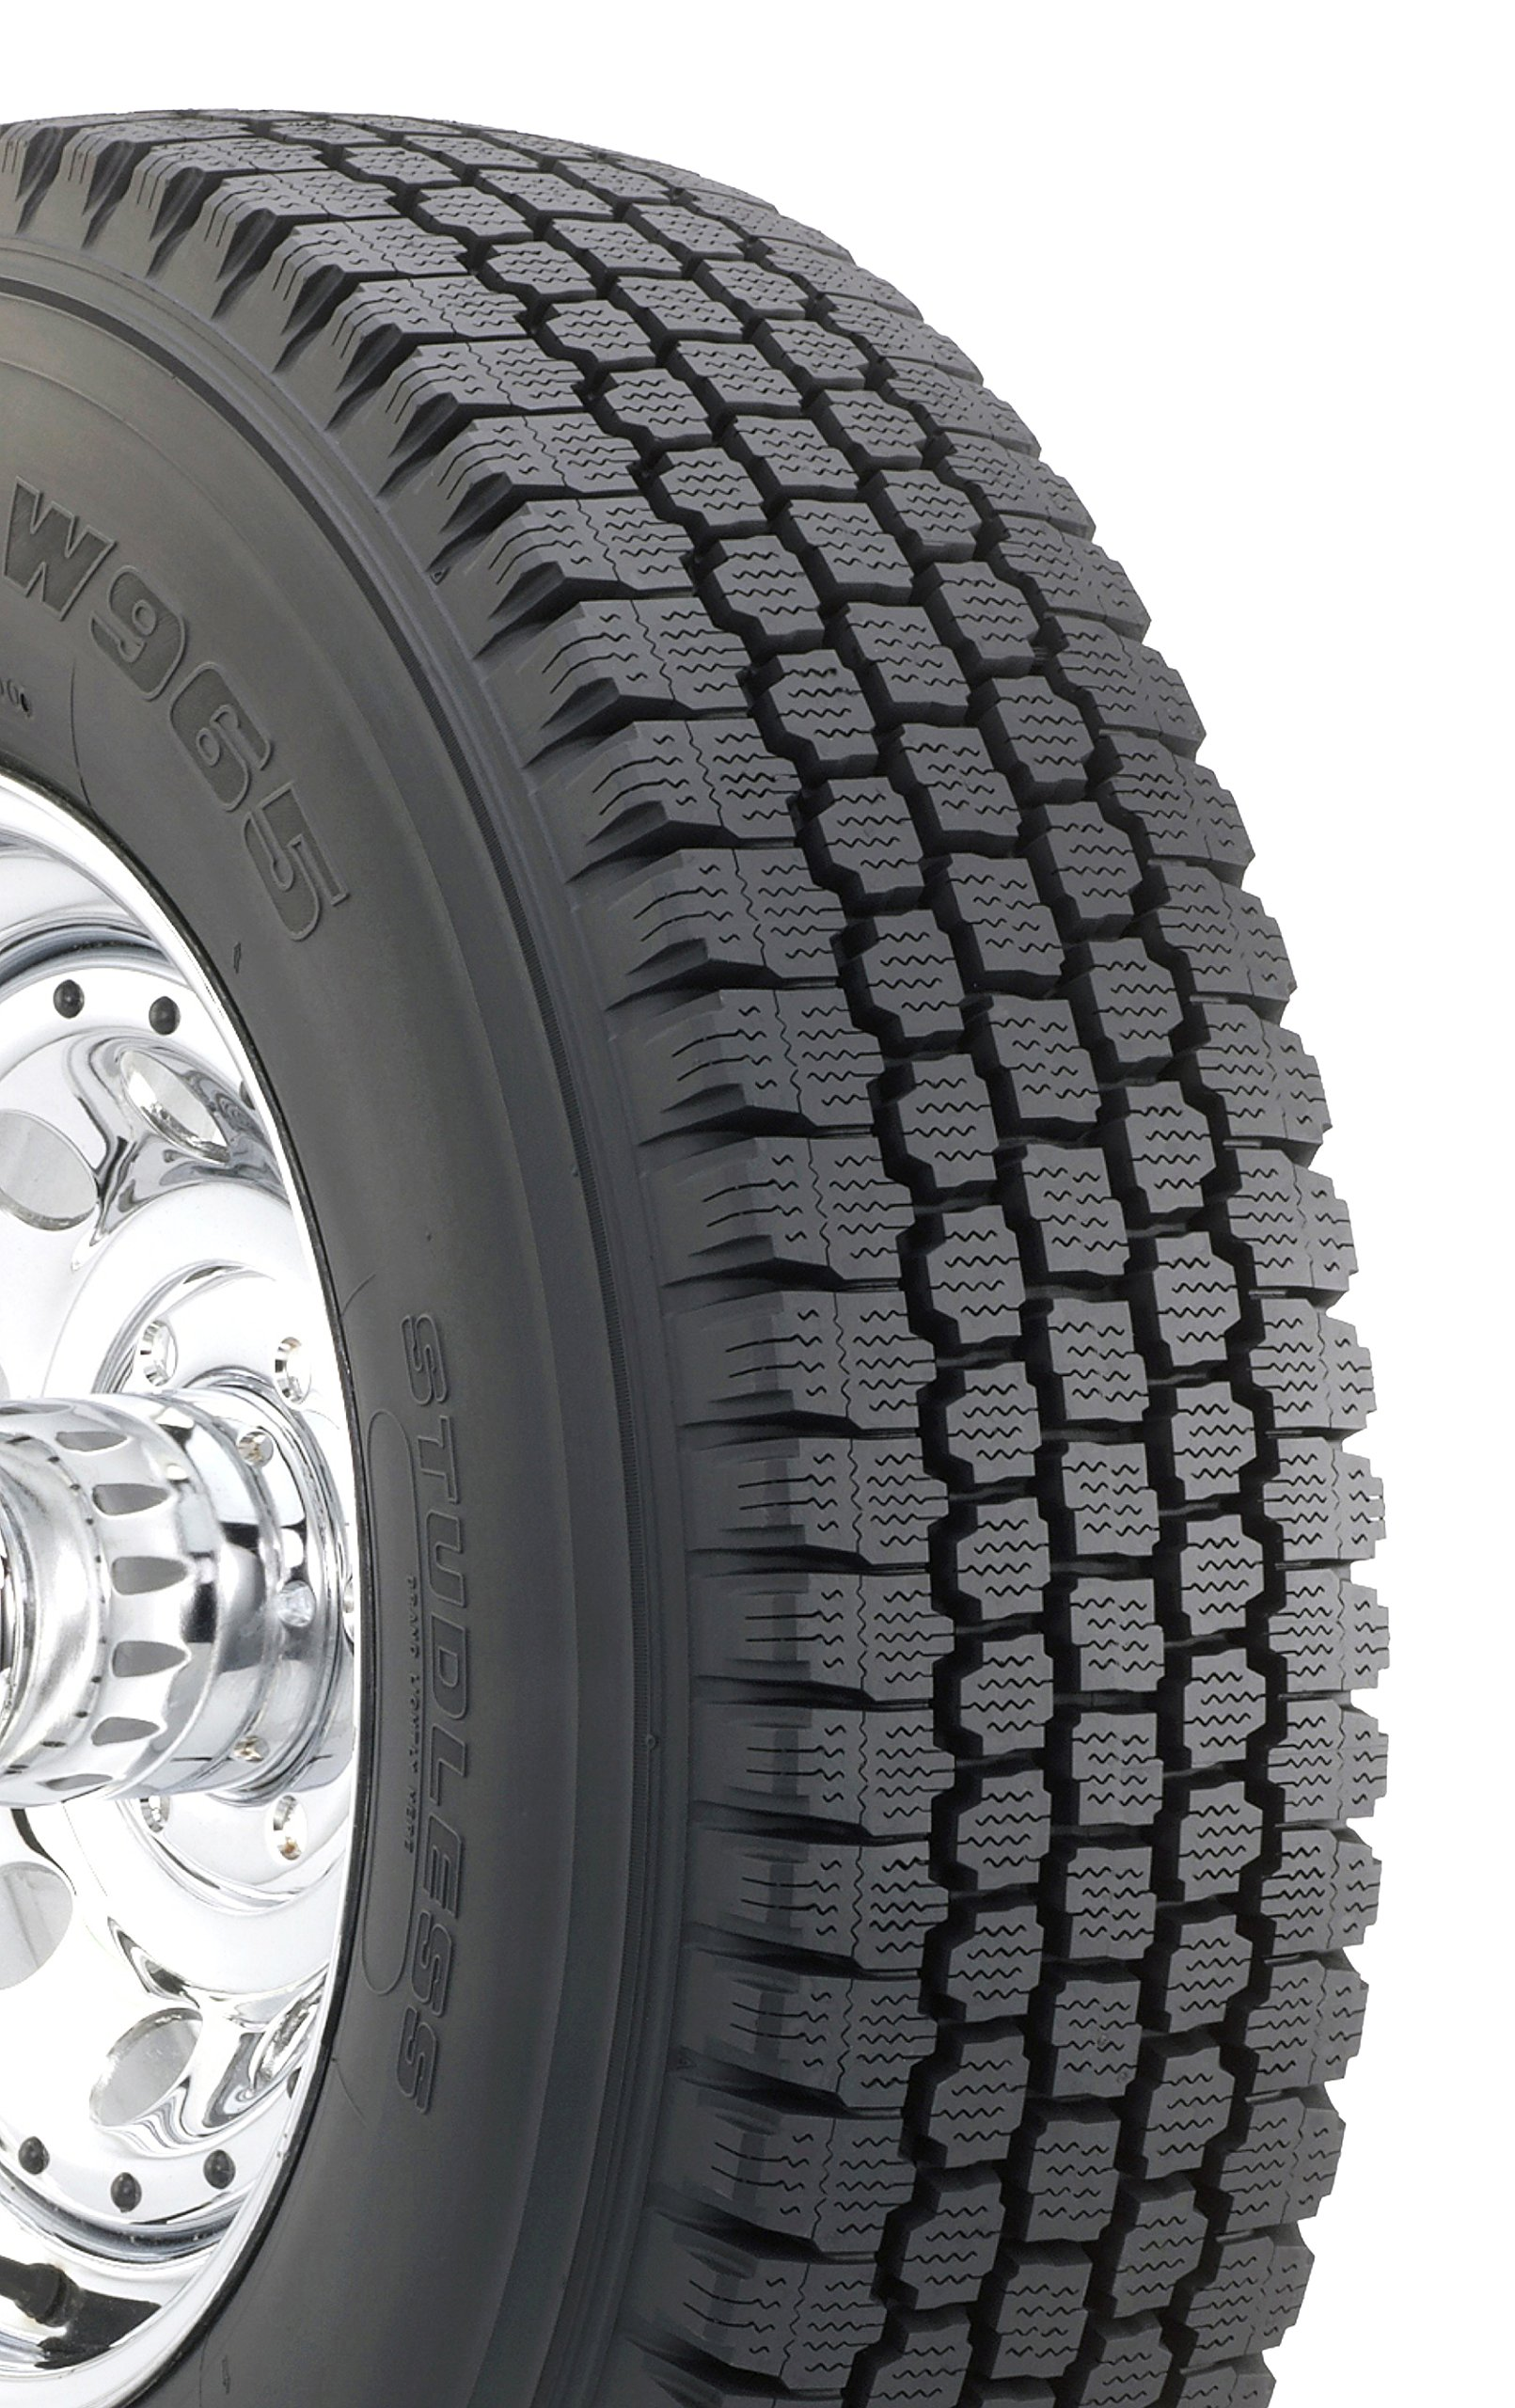 Bridgestone Blizzak W965 Winter Radial Tire - 265/75R16 123Q